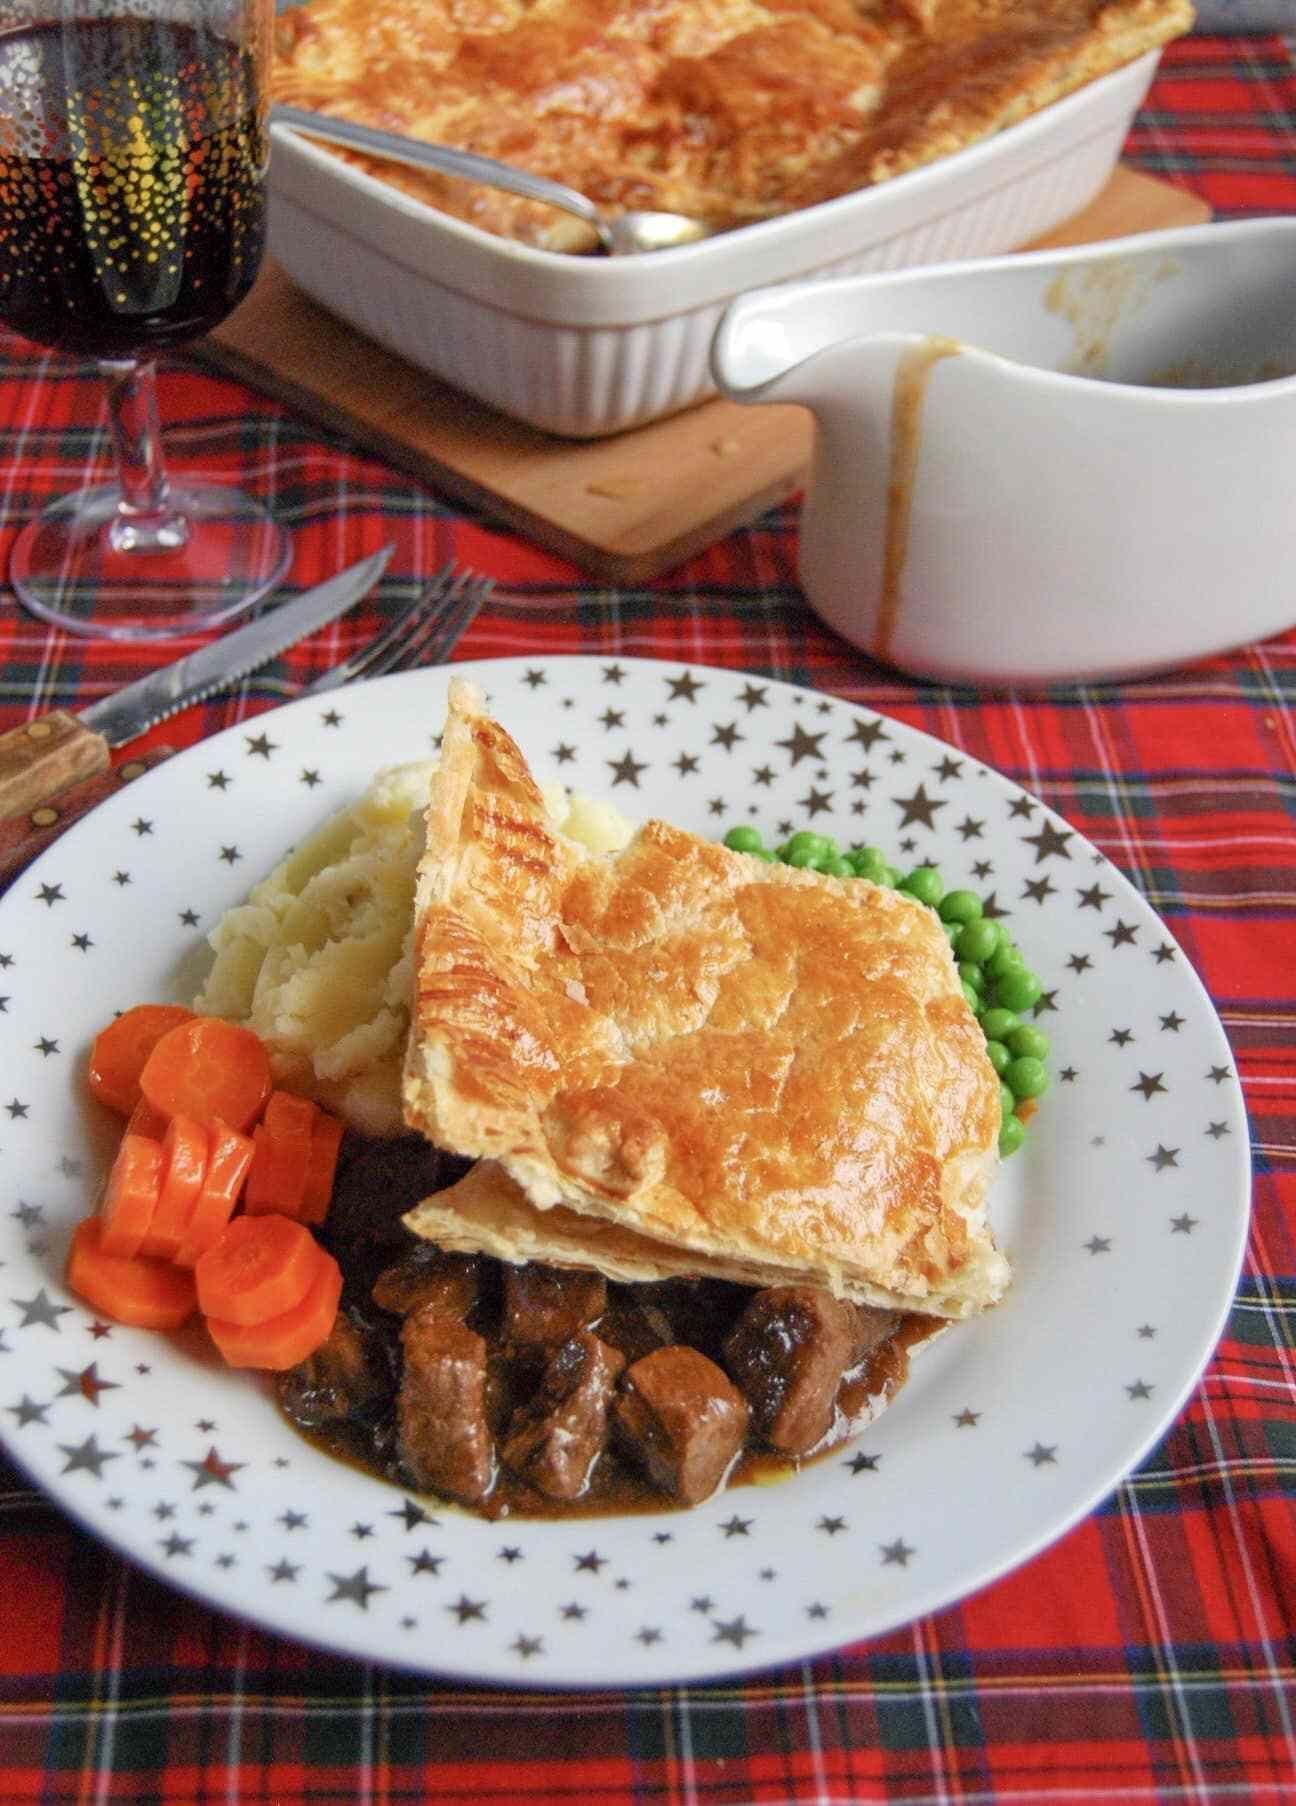 This simple, homemade Scottish steak pie is pure comfort ...